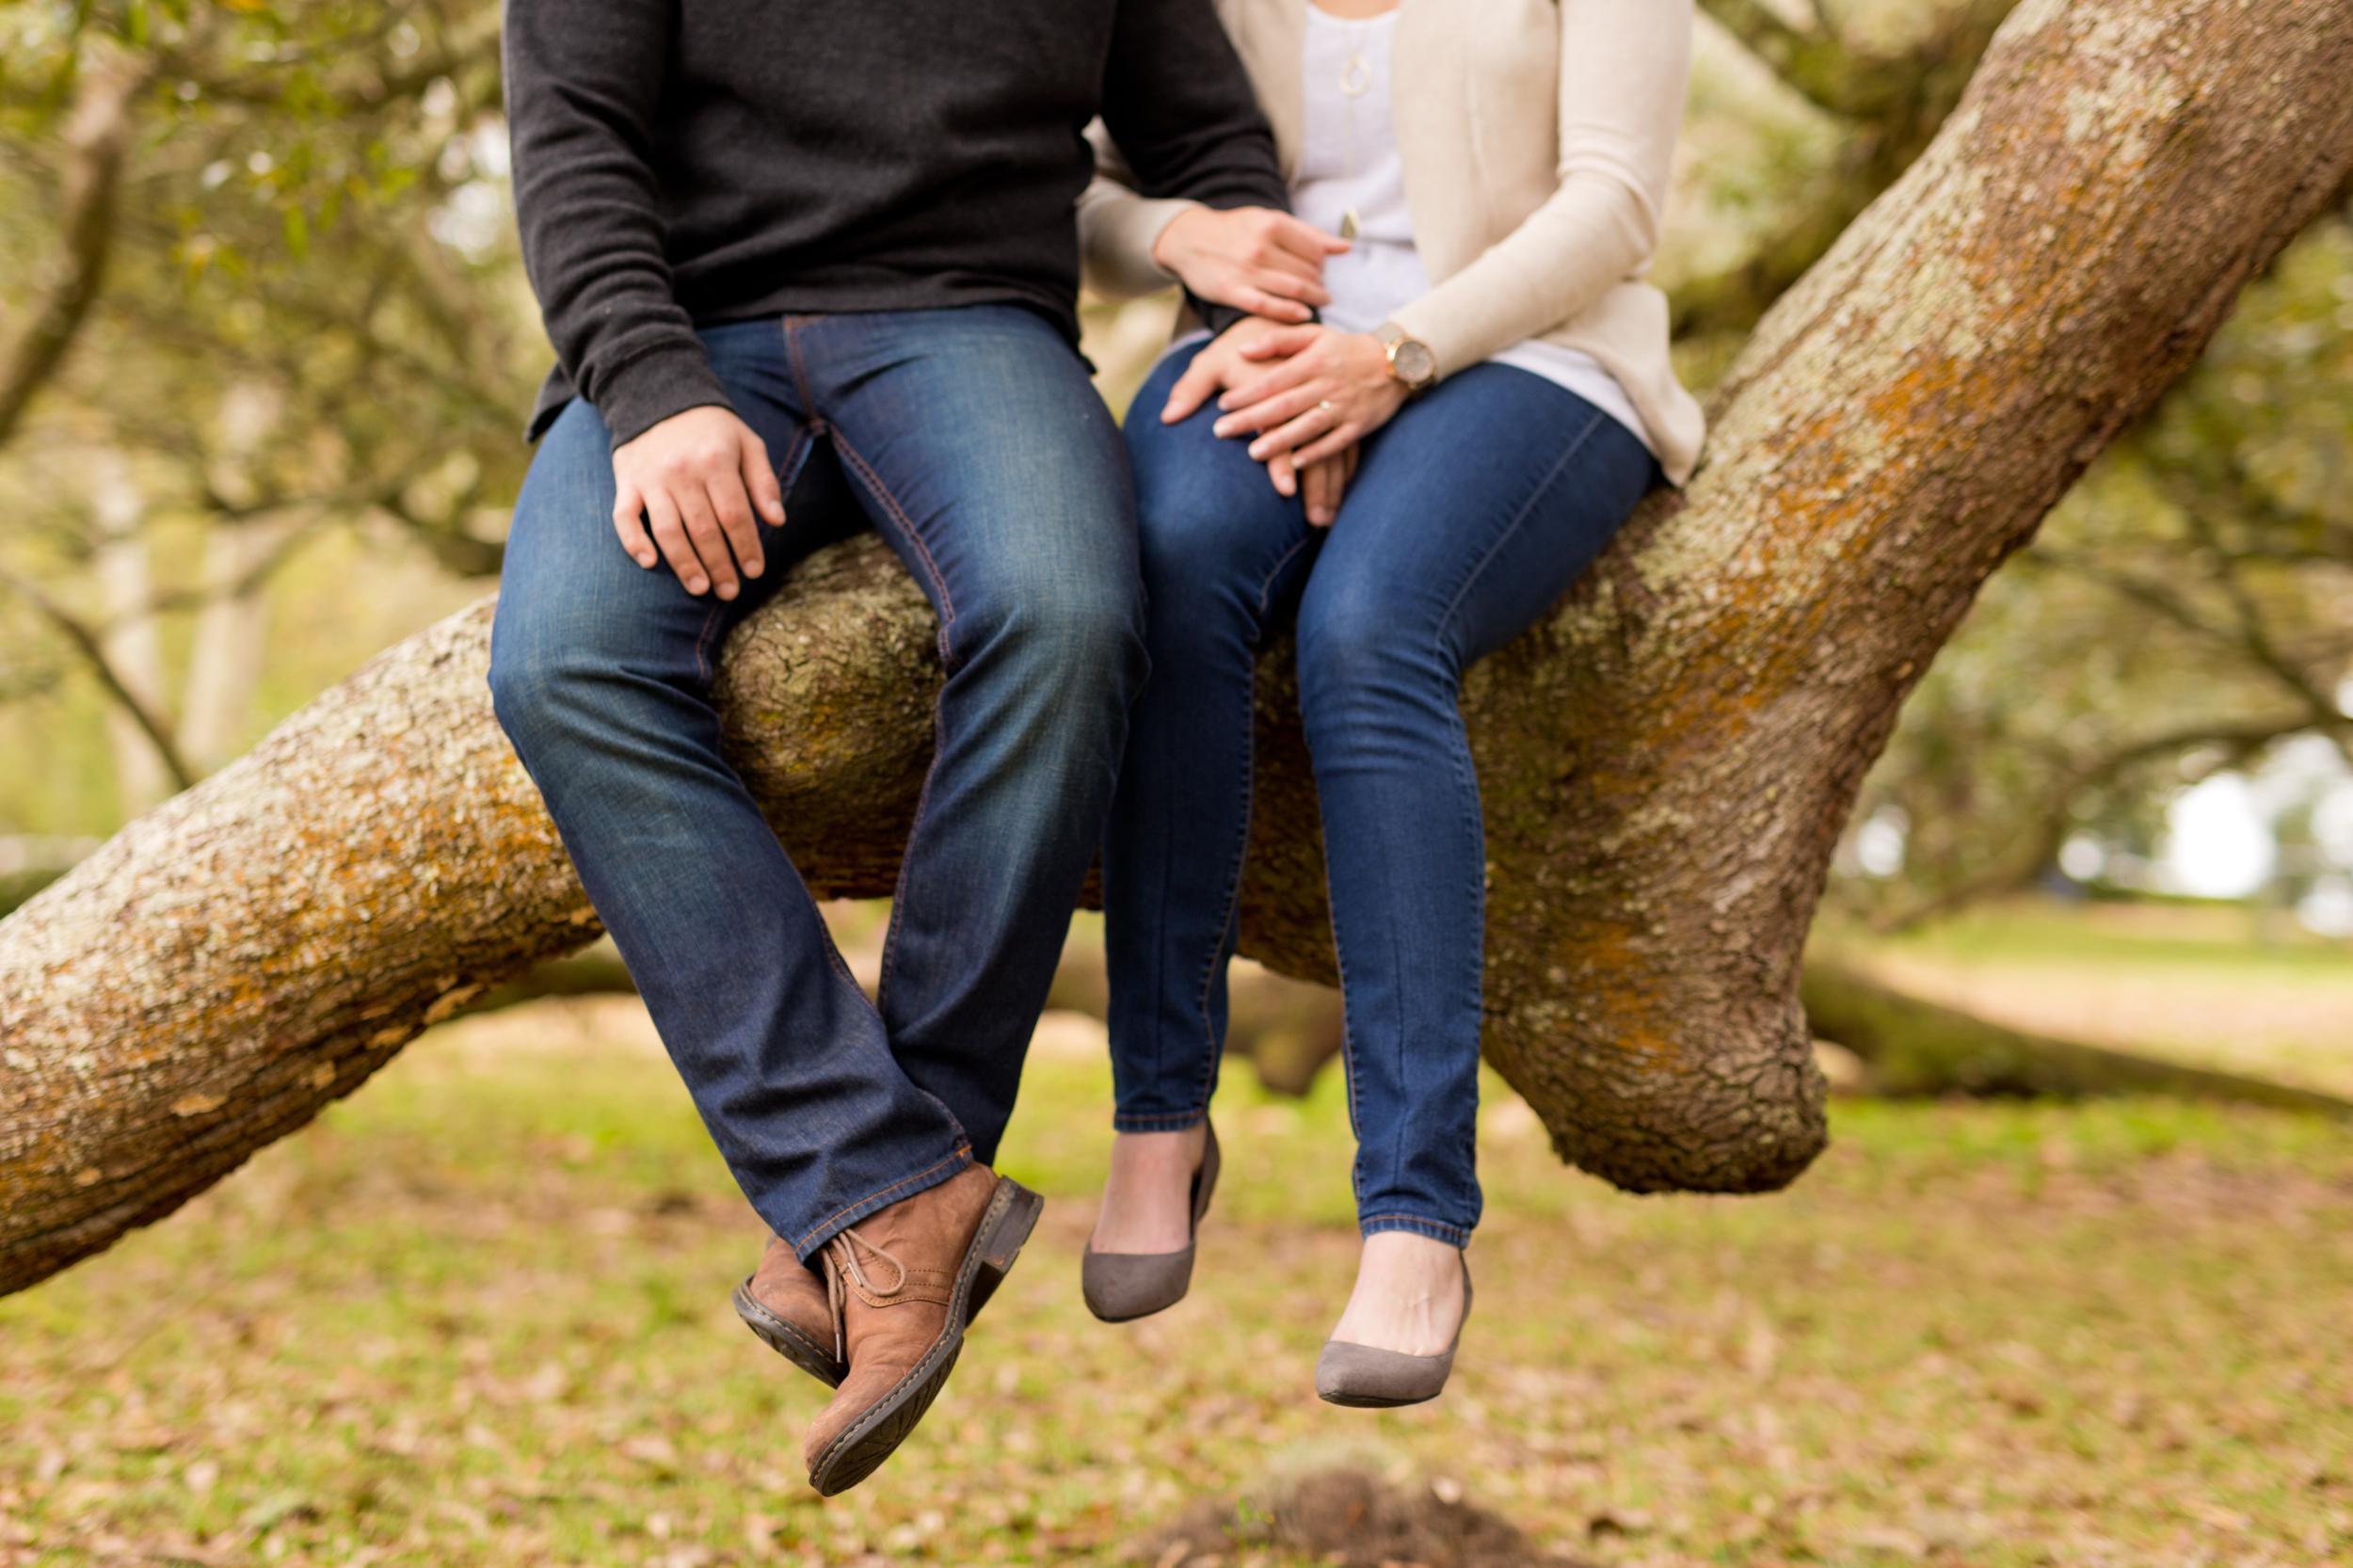 couple's feet and legs, sitting on live oak tree branch in denim blue jeans